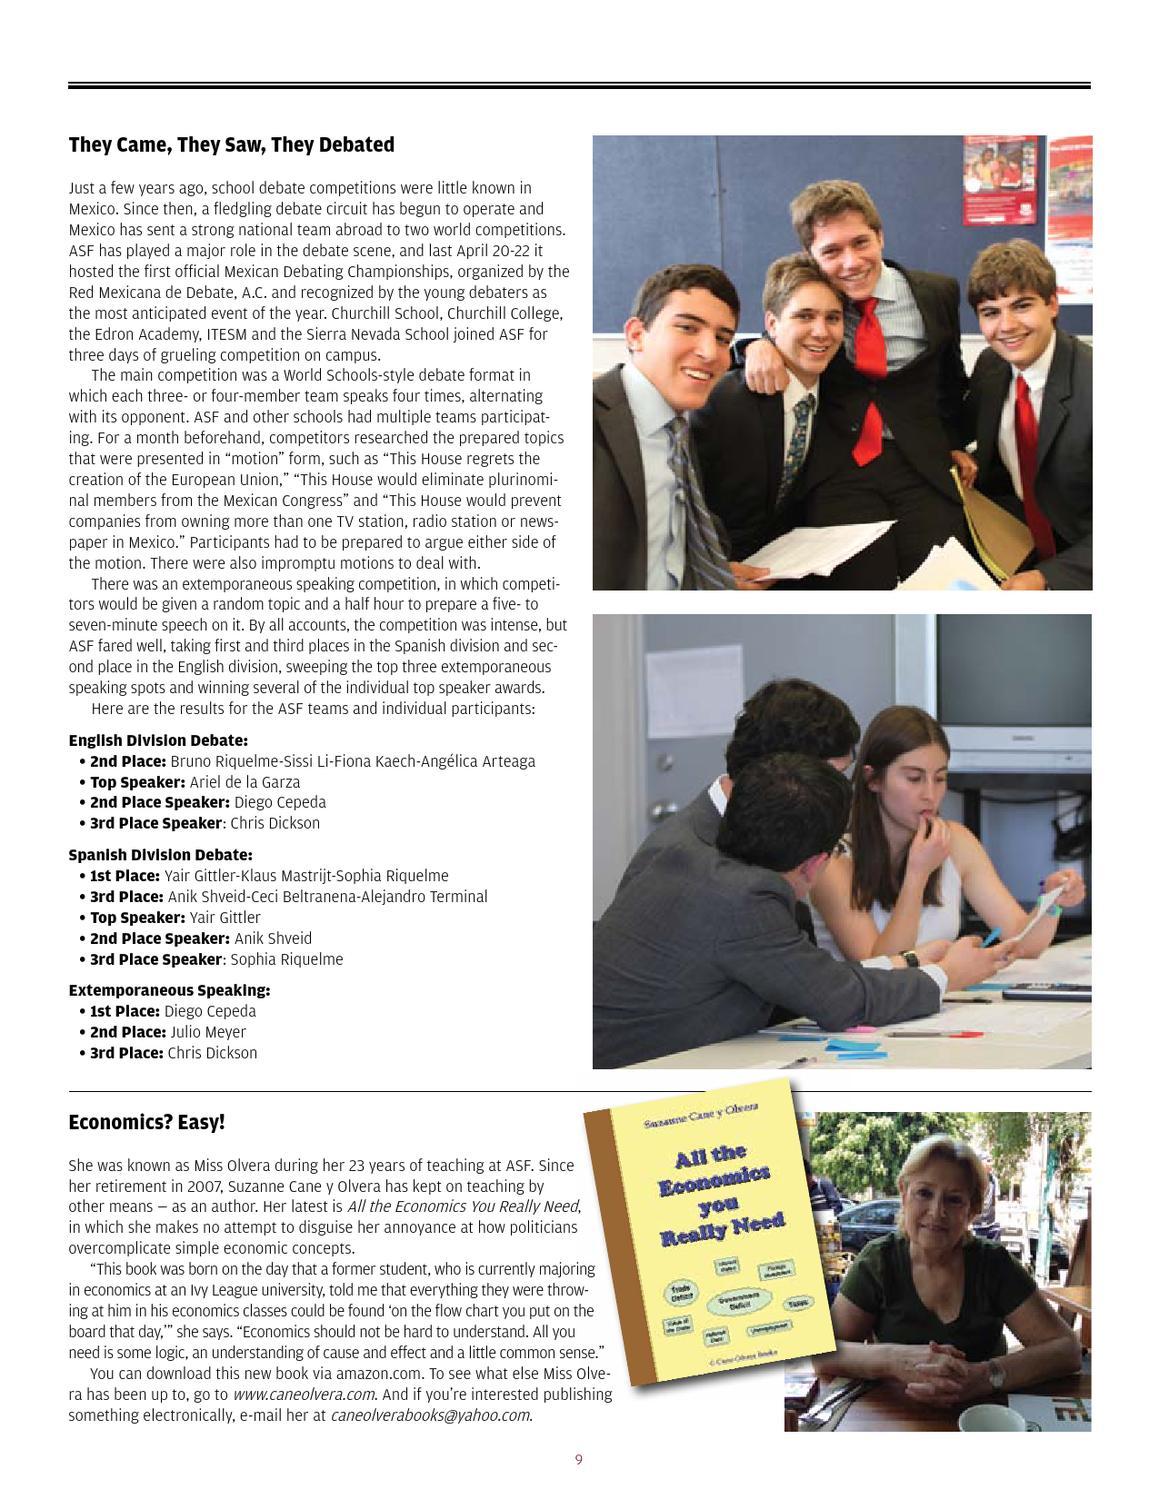 Angelica Cepeda focus summer/fall 2012the american school foundation